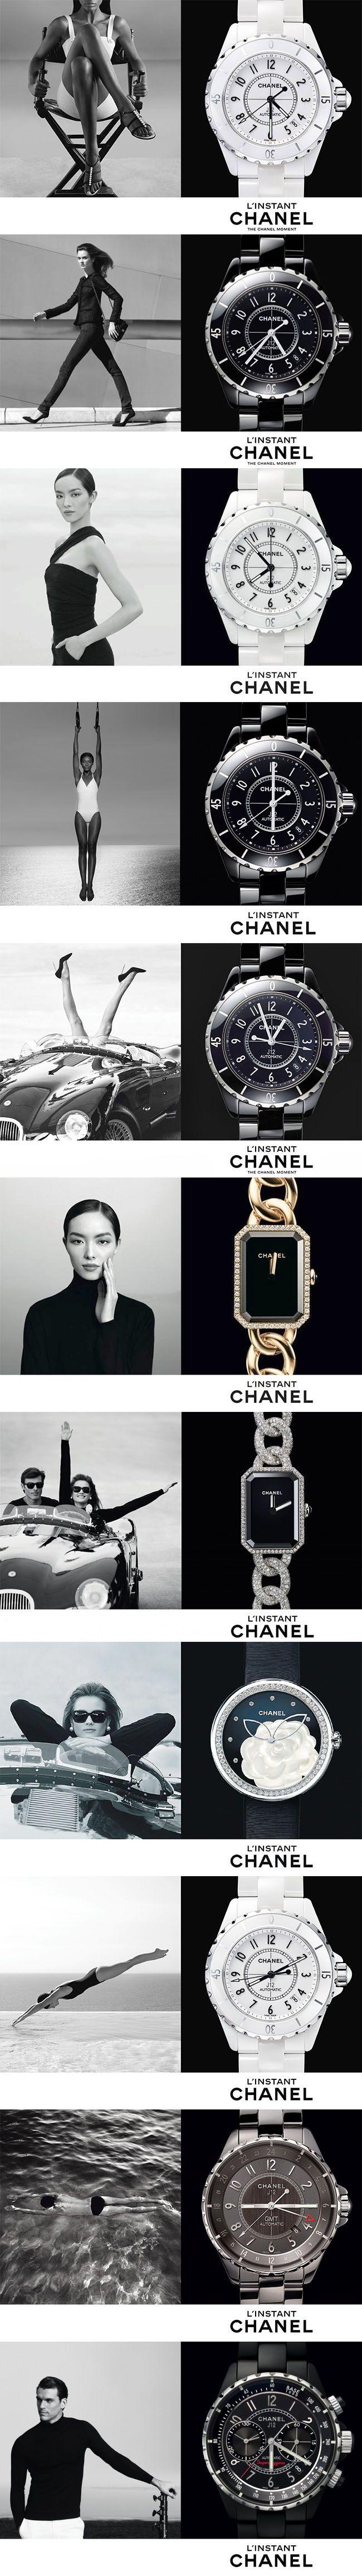 L'Instant Chanel 2014 Campaign